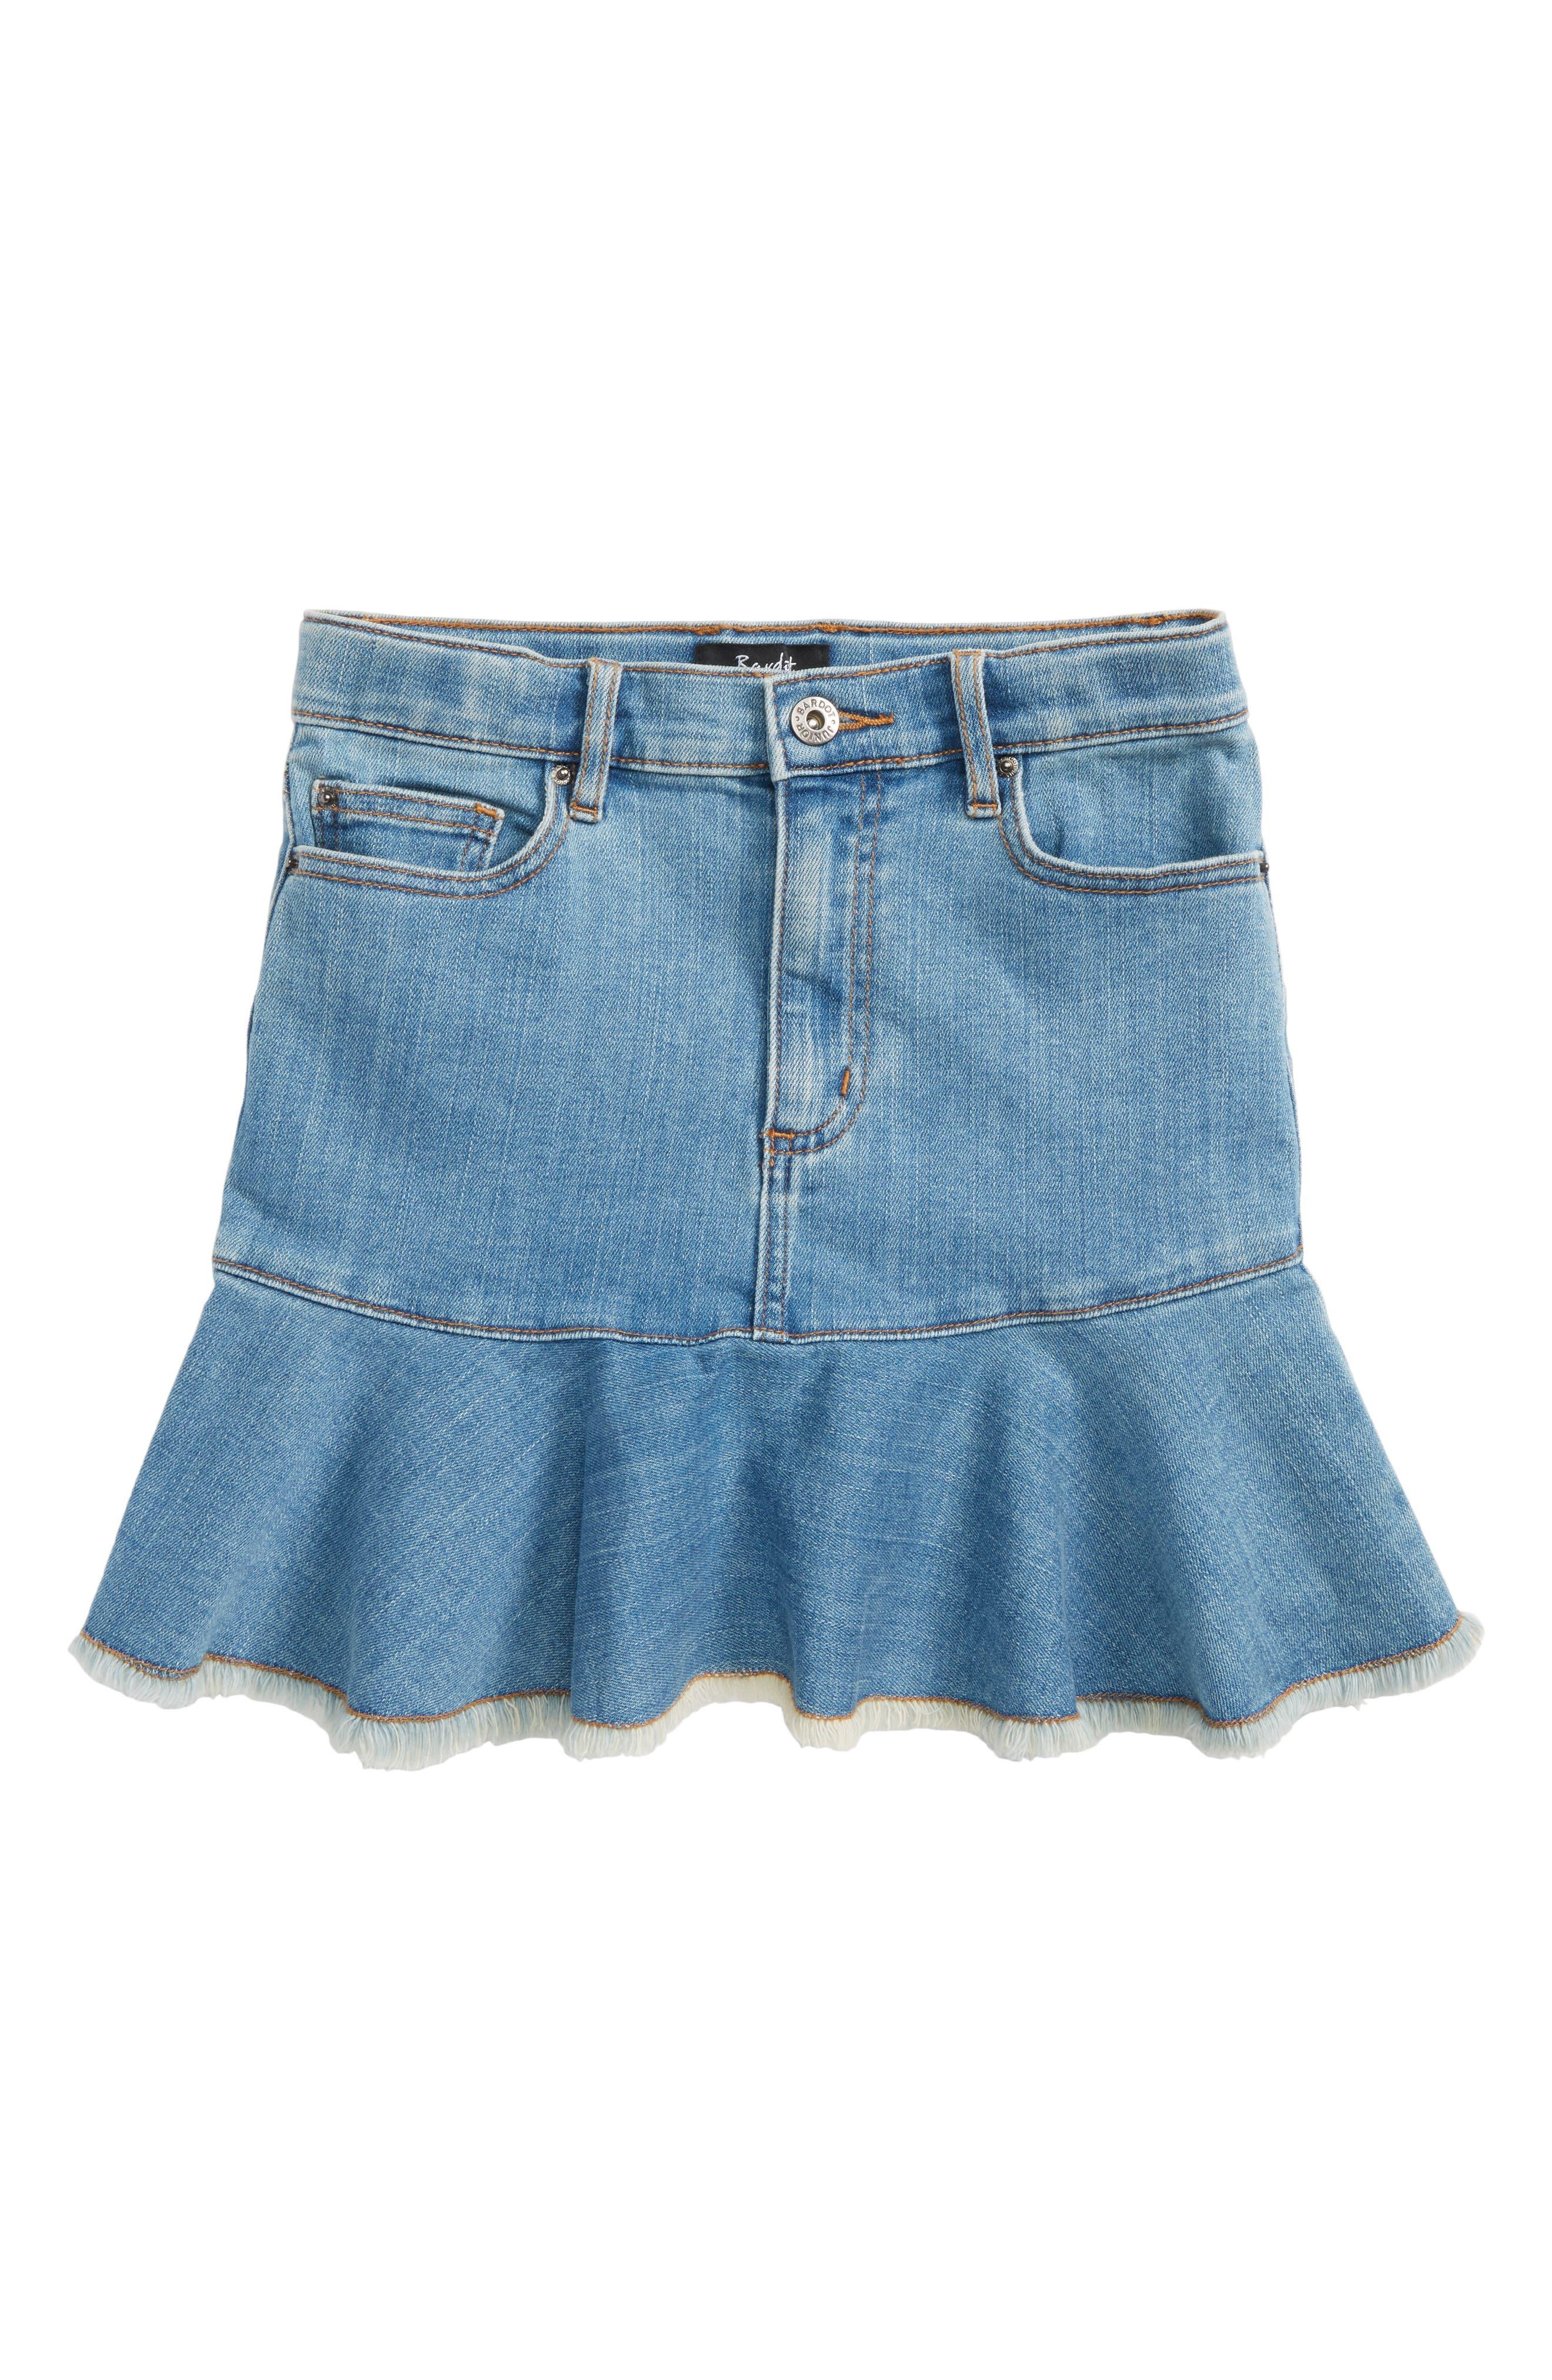 Mia Denim Skirt,                         Main,                         color, 428